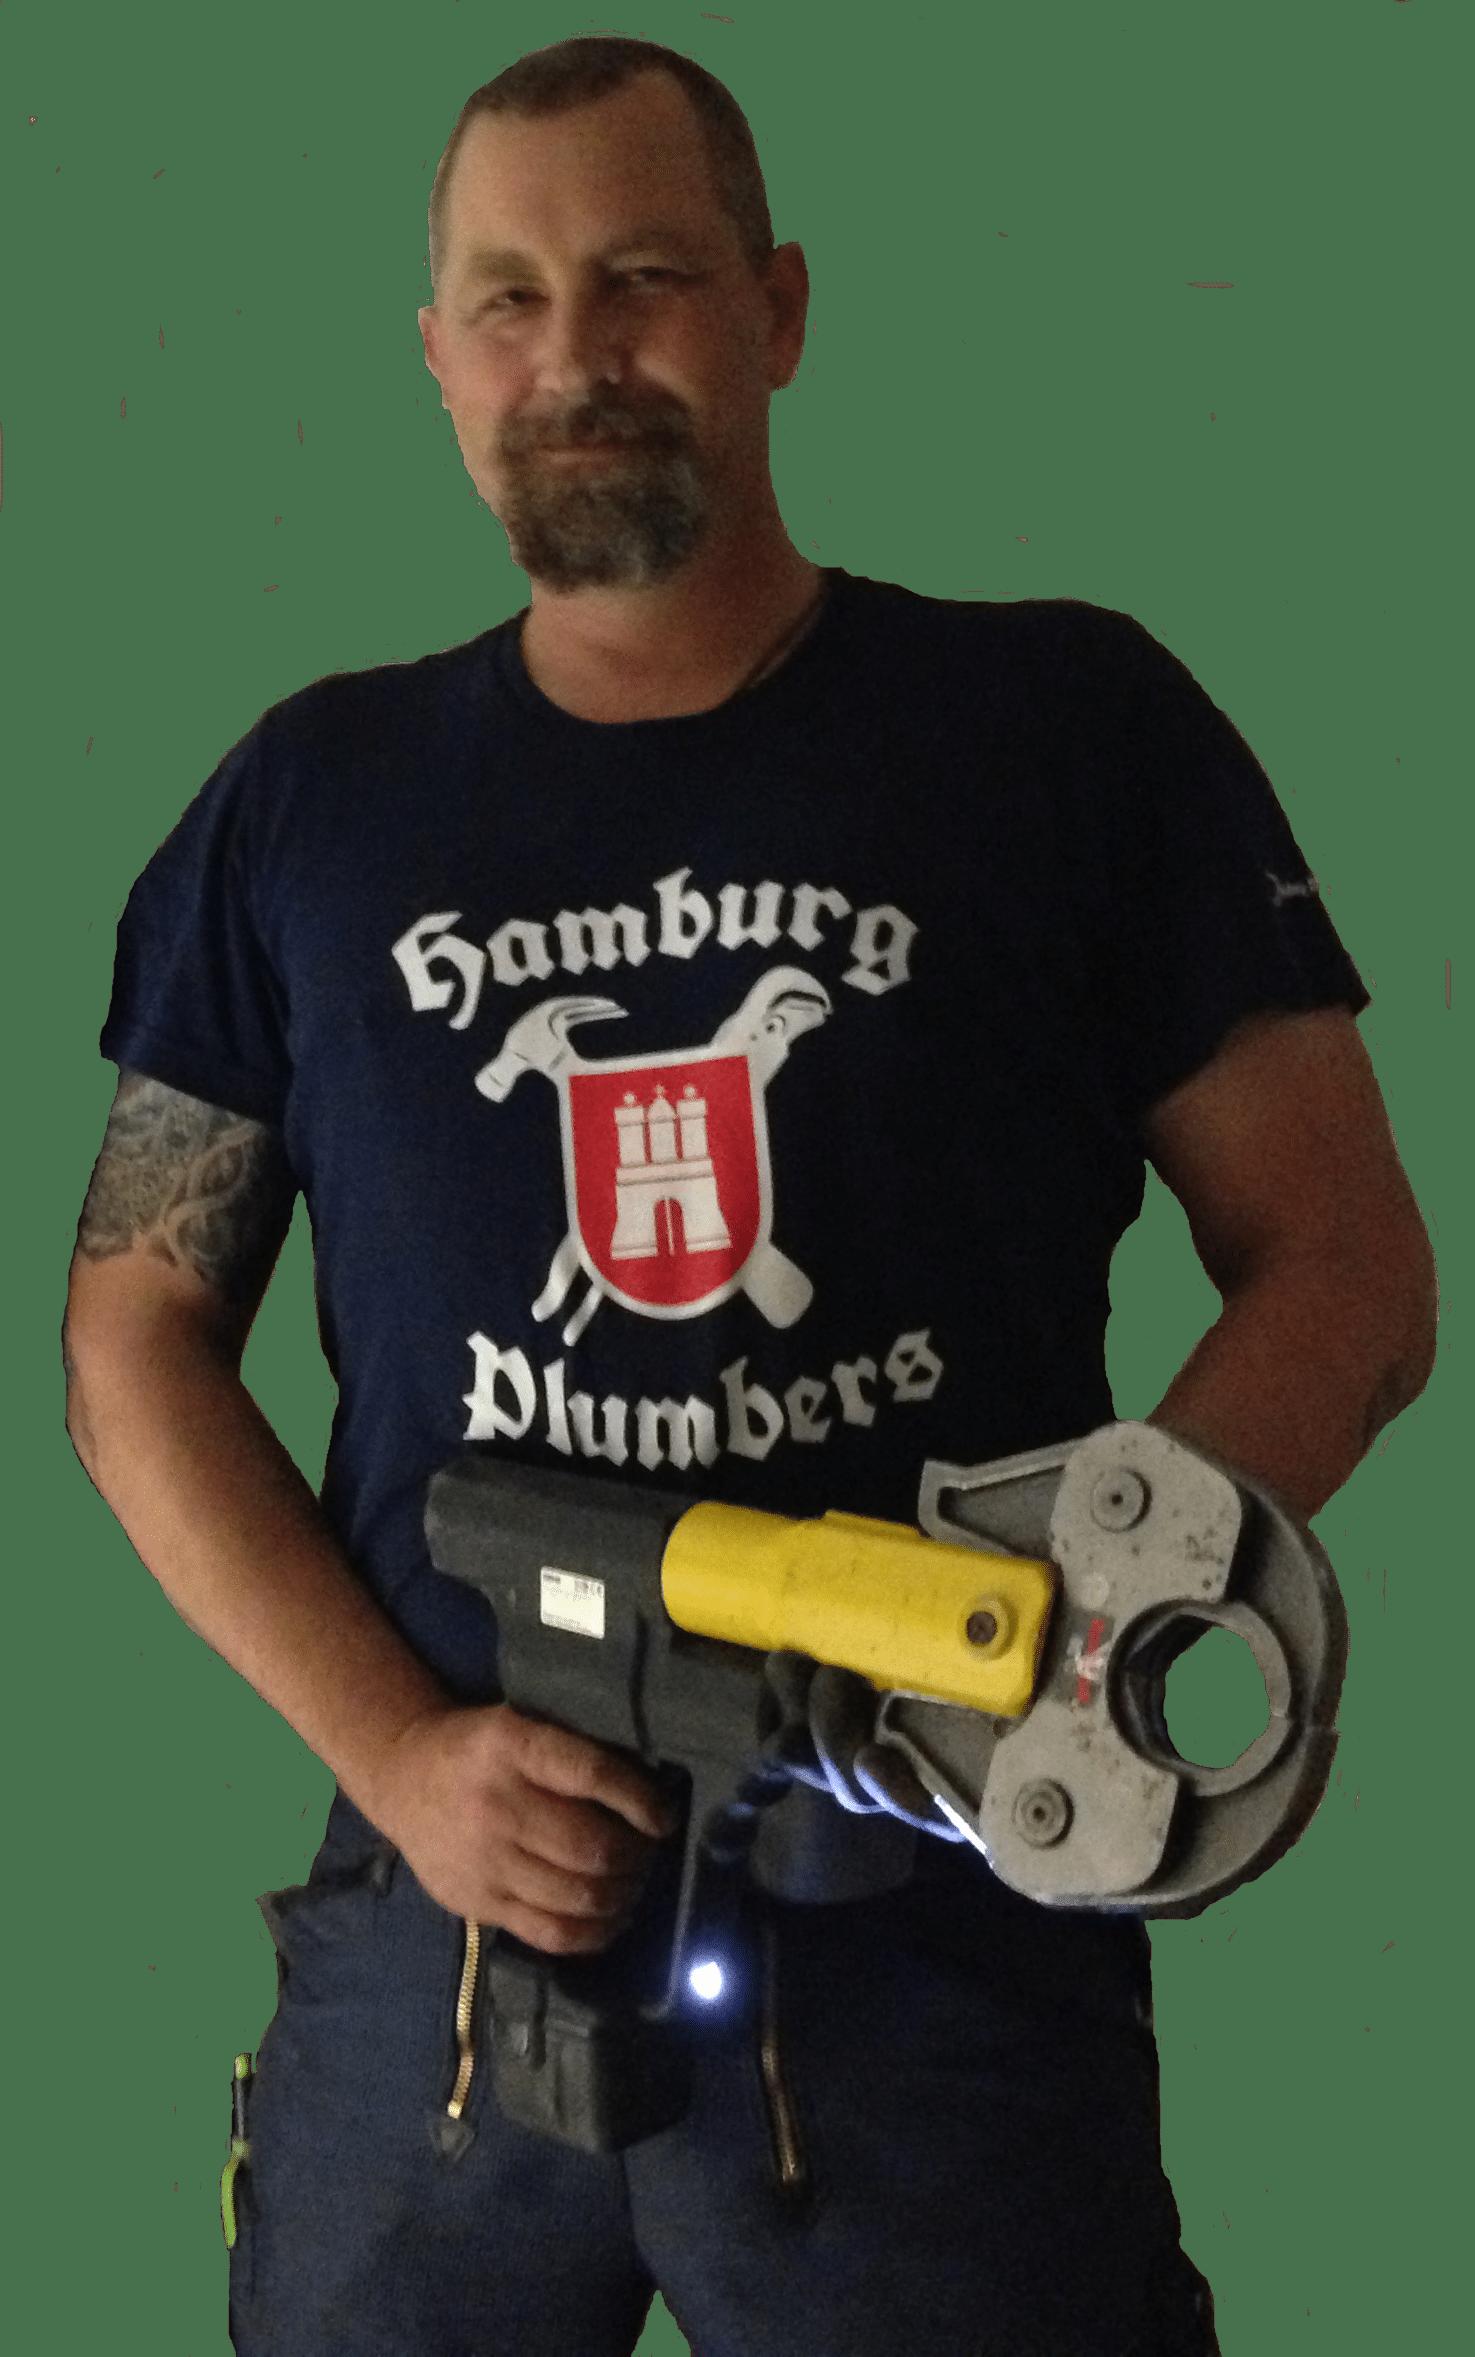 sebastian duus hamburg plumbers